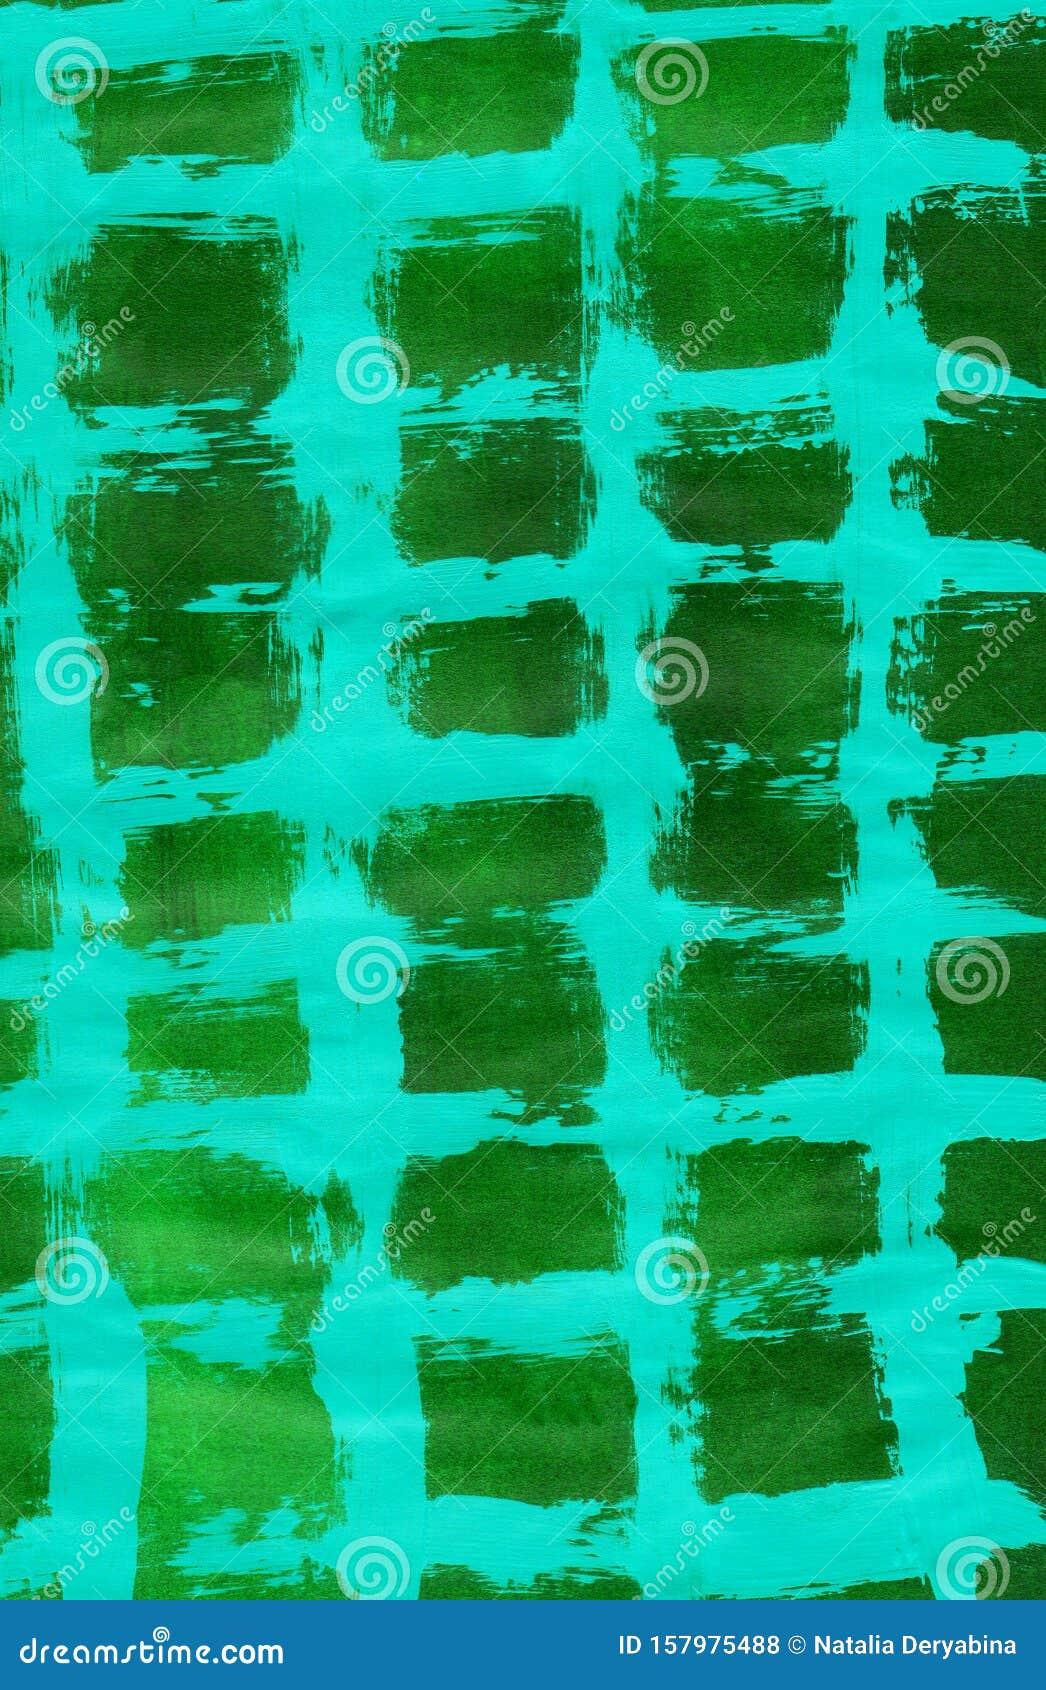 Texture Background Wallpaper Neon Colors Green On Dark Green